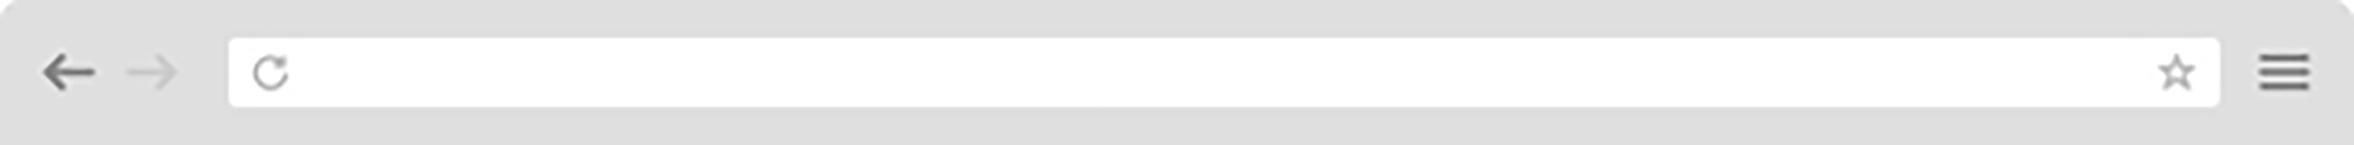 web address bar.jpg